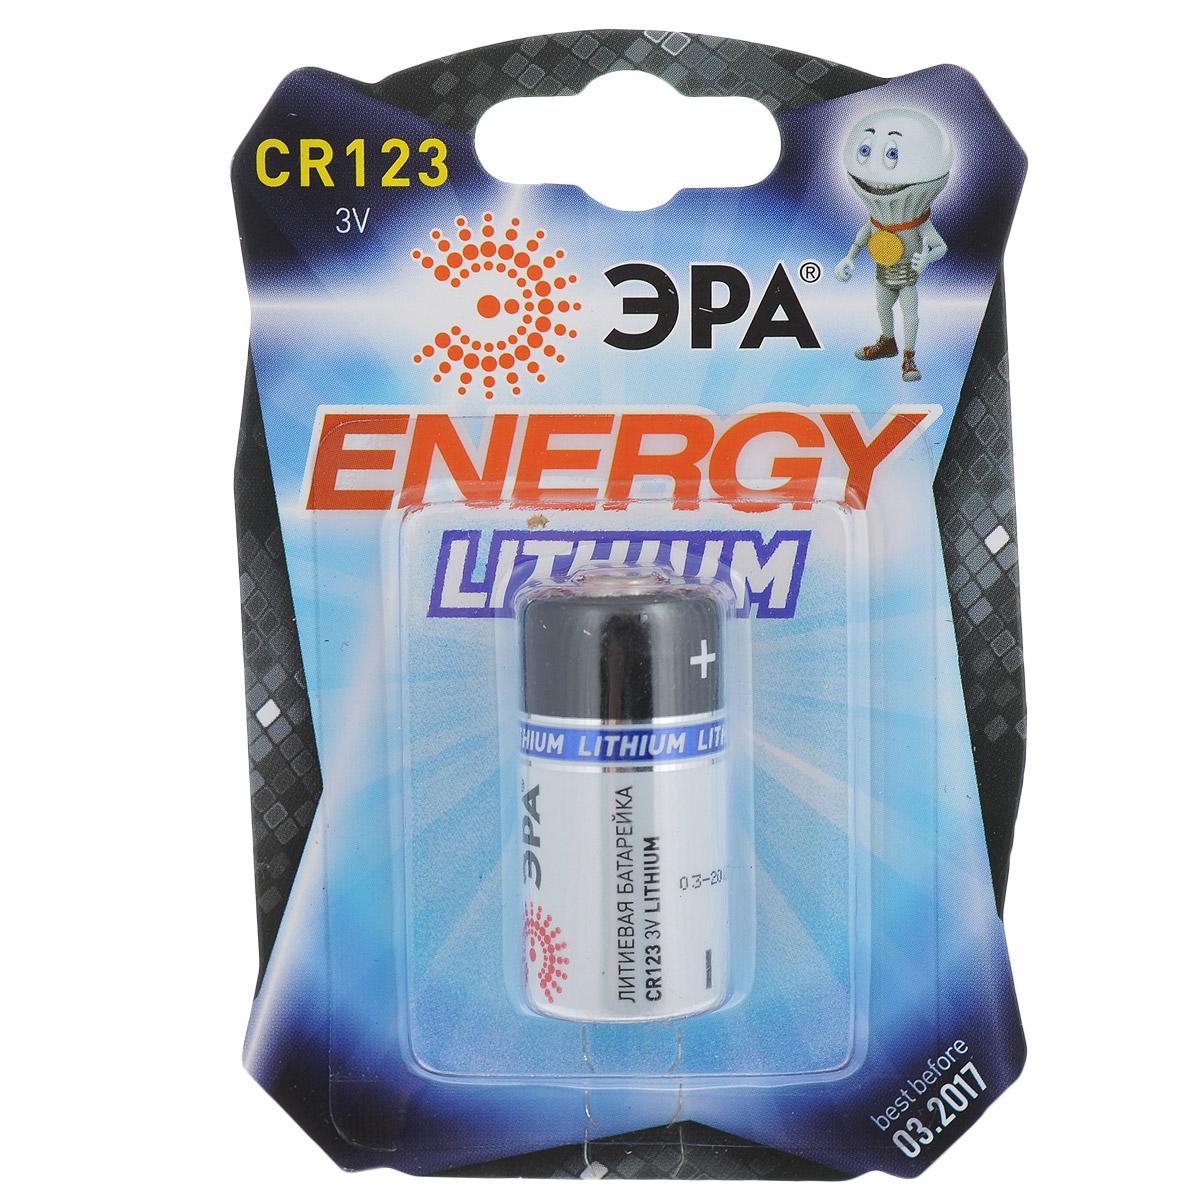 Батарейка литиевая ЭРА Energy, тип CR123 (1BL), 3В батарейка алкалиновая эра energy тип a27 1bl 12в